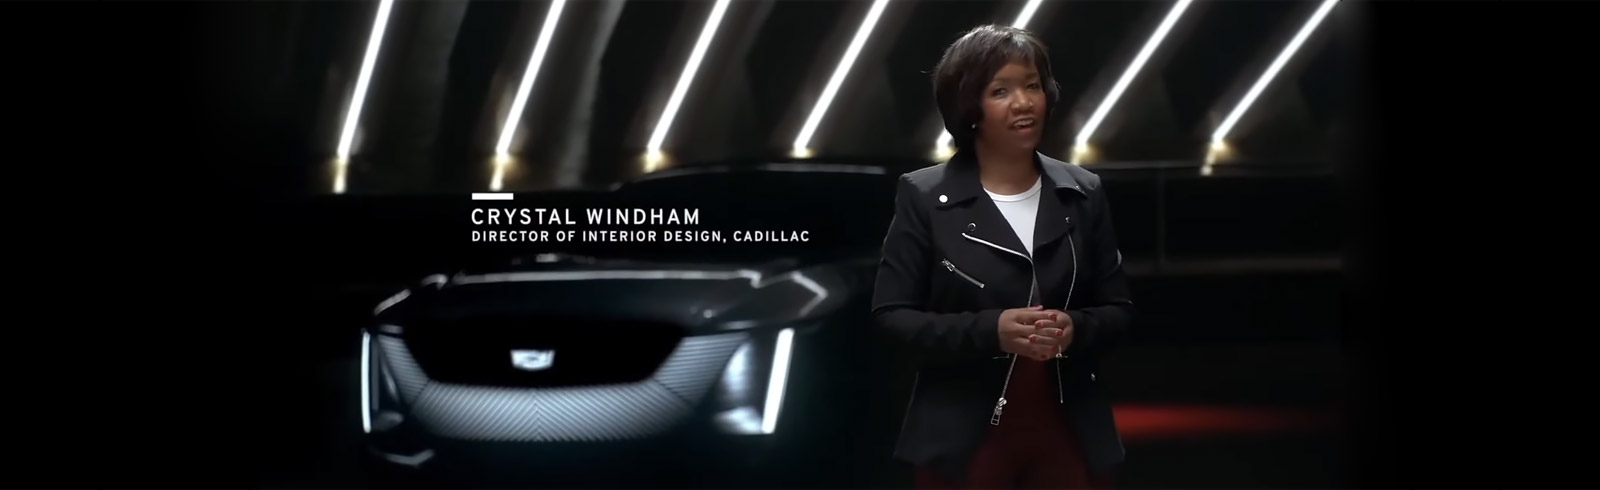 GM teases the Cadillac Celestiq at CES 2021